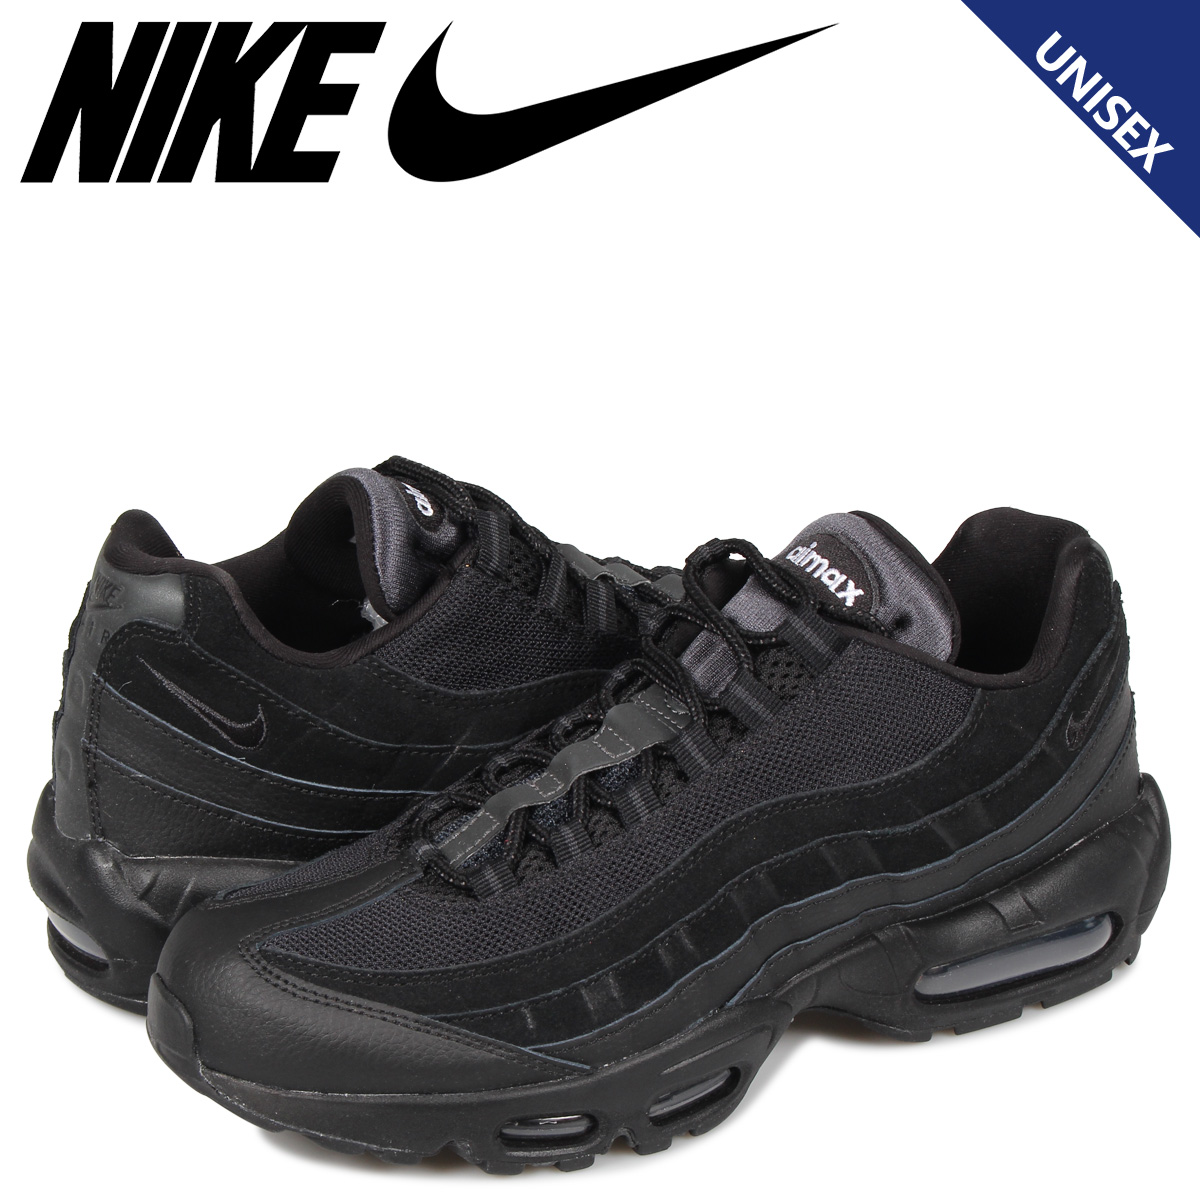 Nike Air Max 95 Essential Triple Black AT9865 001 Release